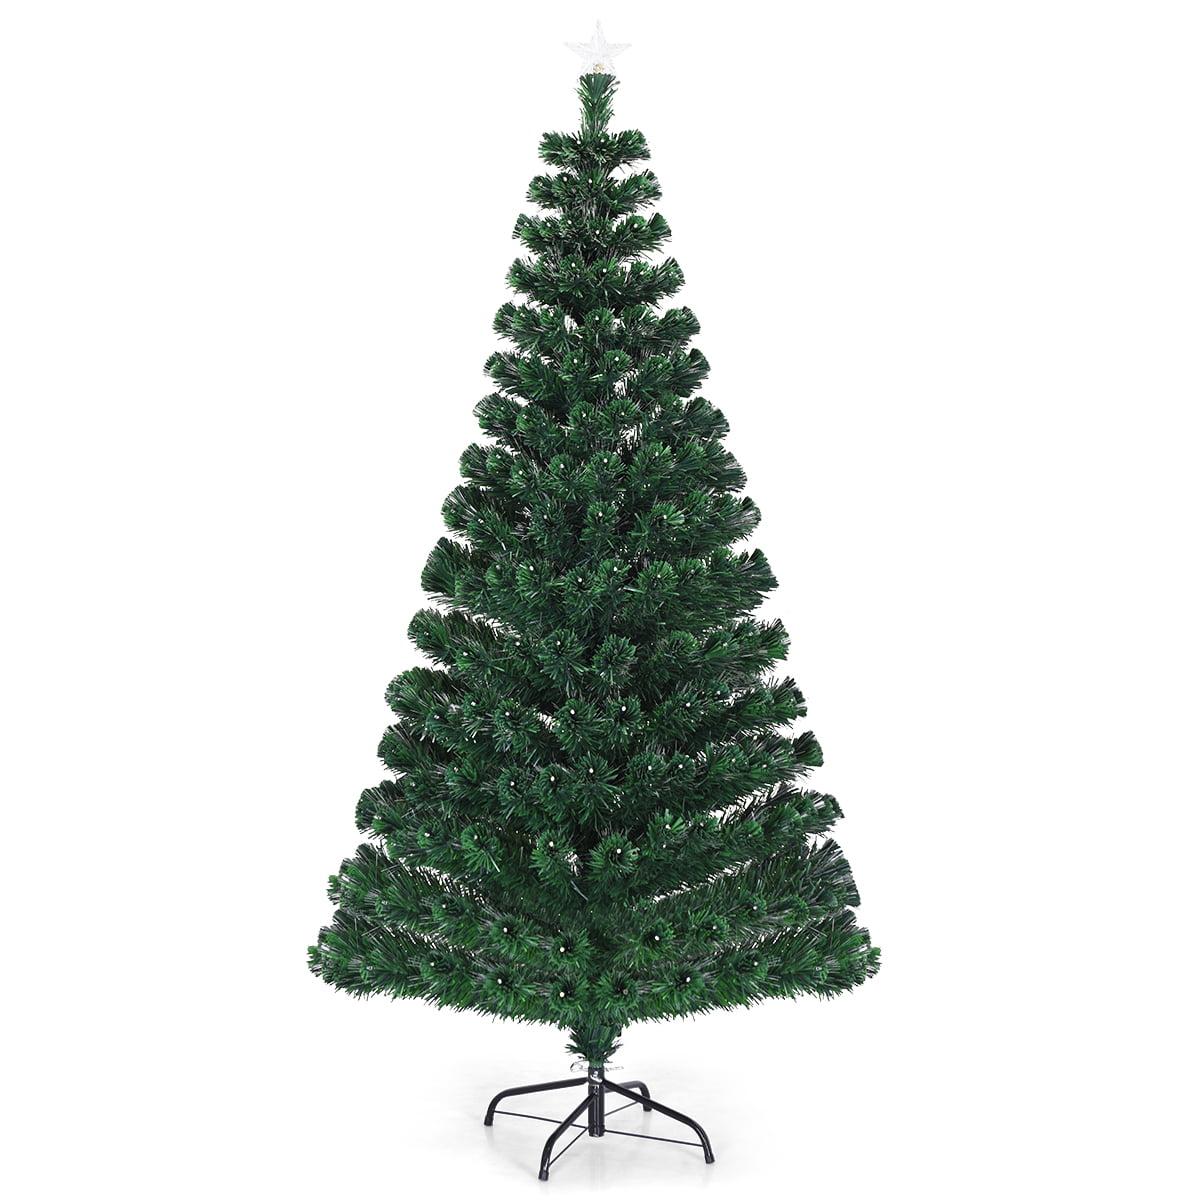 Costway 5'/6'/7'Pre-Lit Fiber Optic Christmas Tree 180/230/280 Lights Top Star